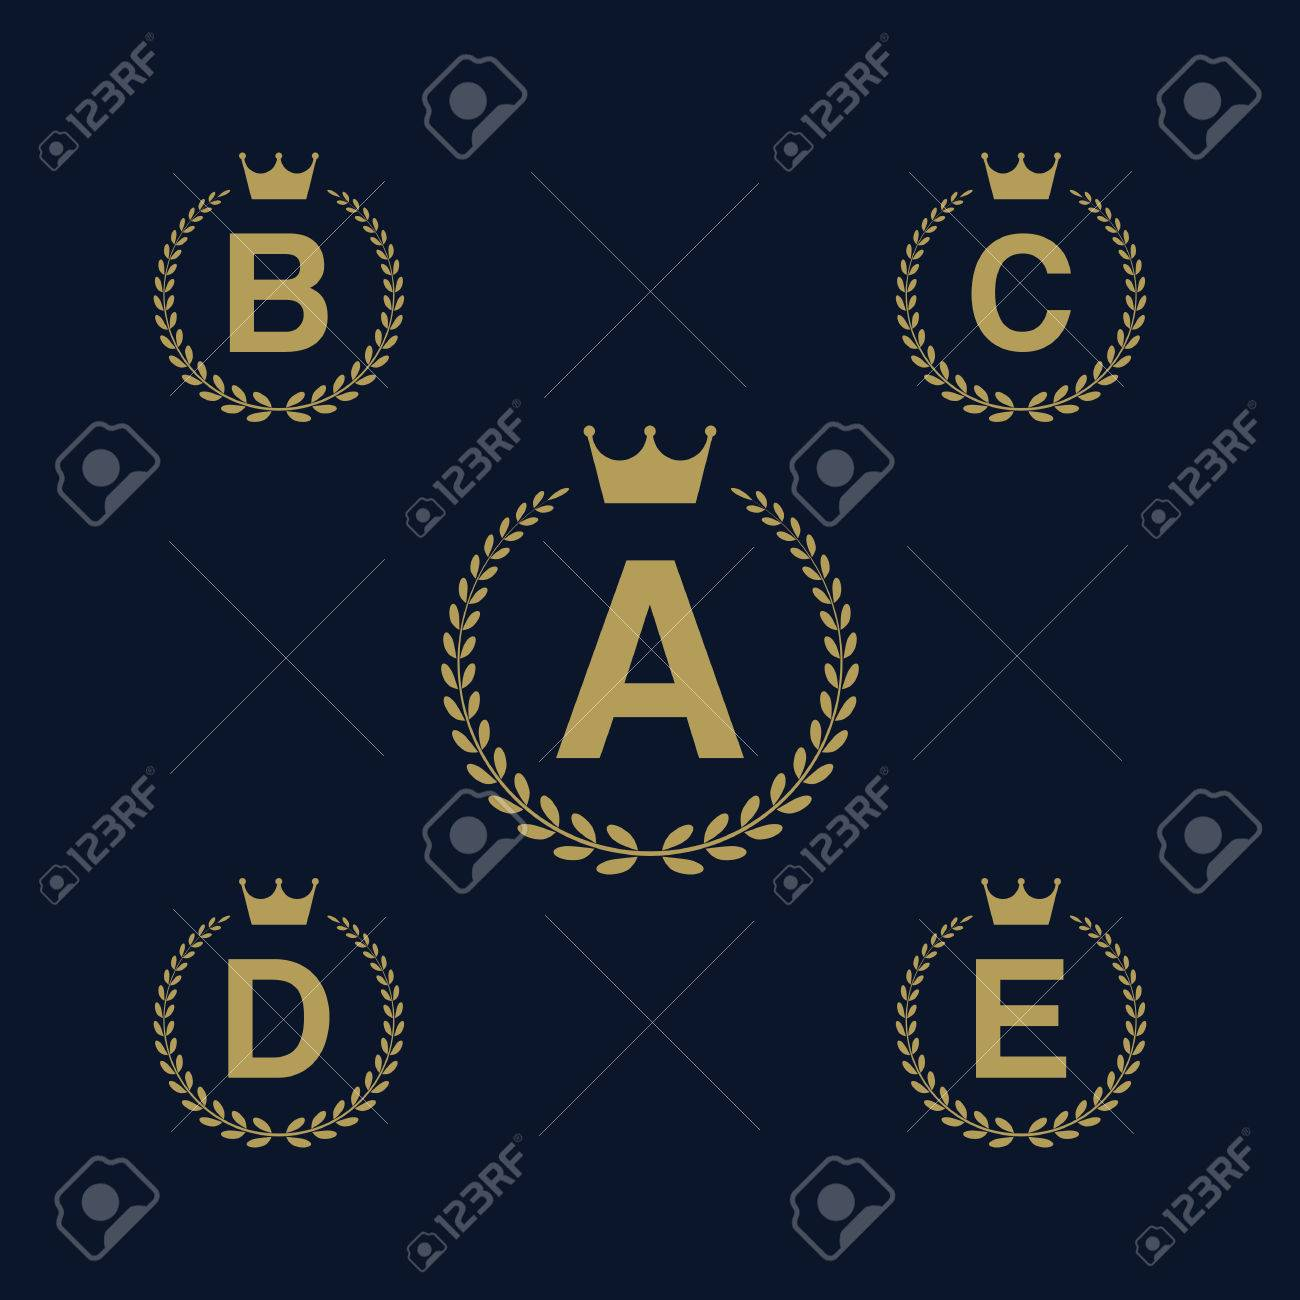 9300442e Laurel wreath logo icon with capital alphabet letters. Design template  elements - Letter A,